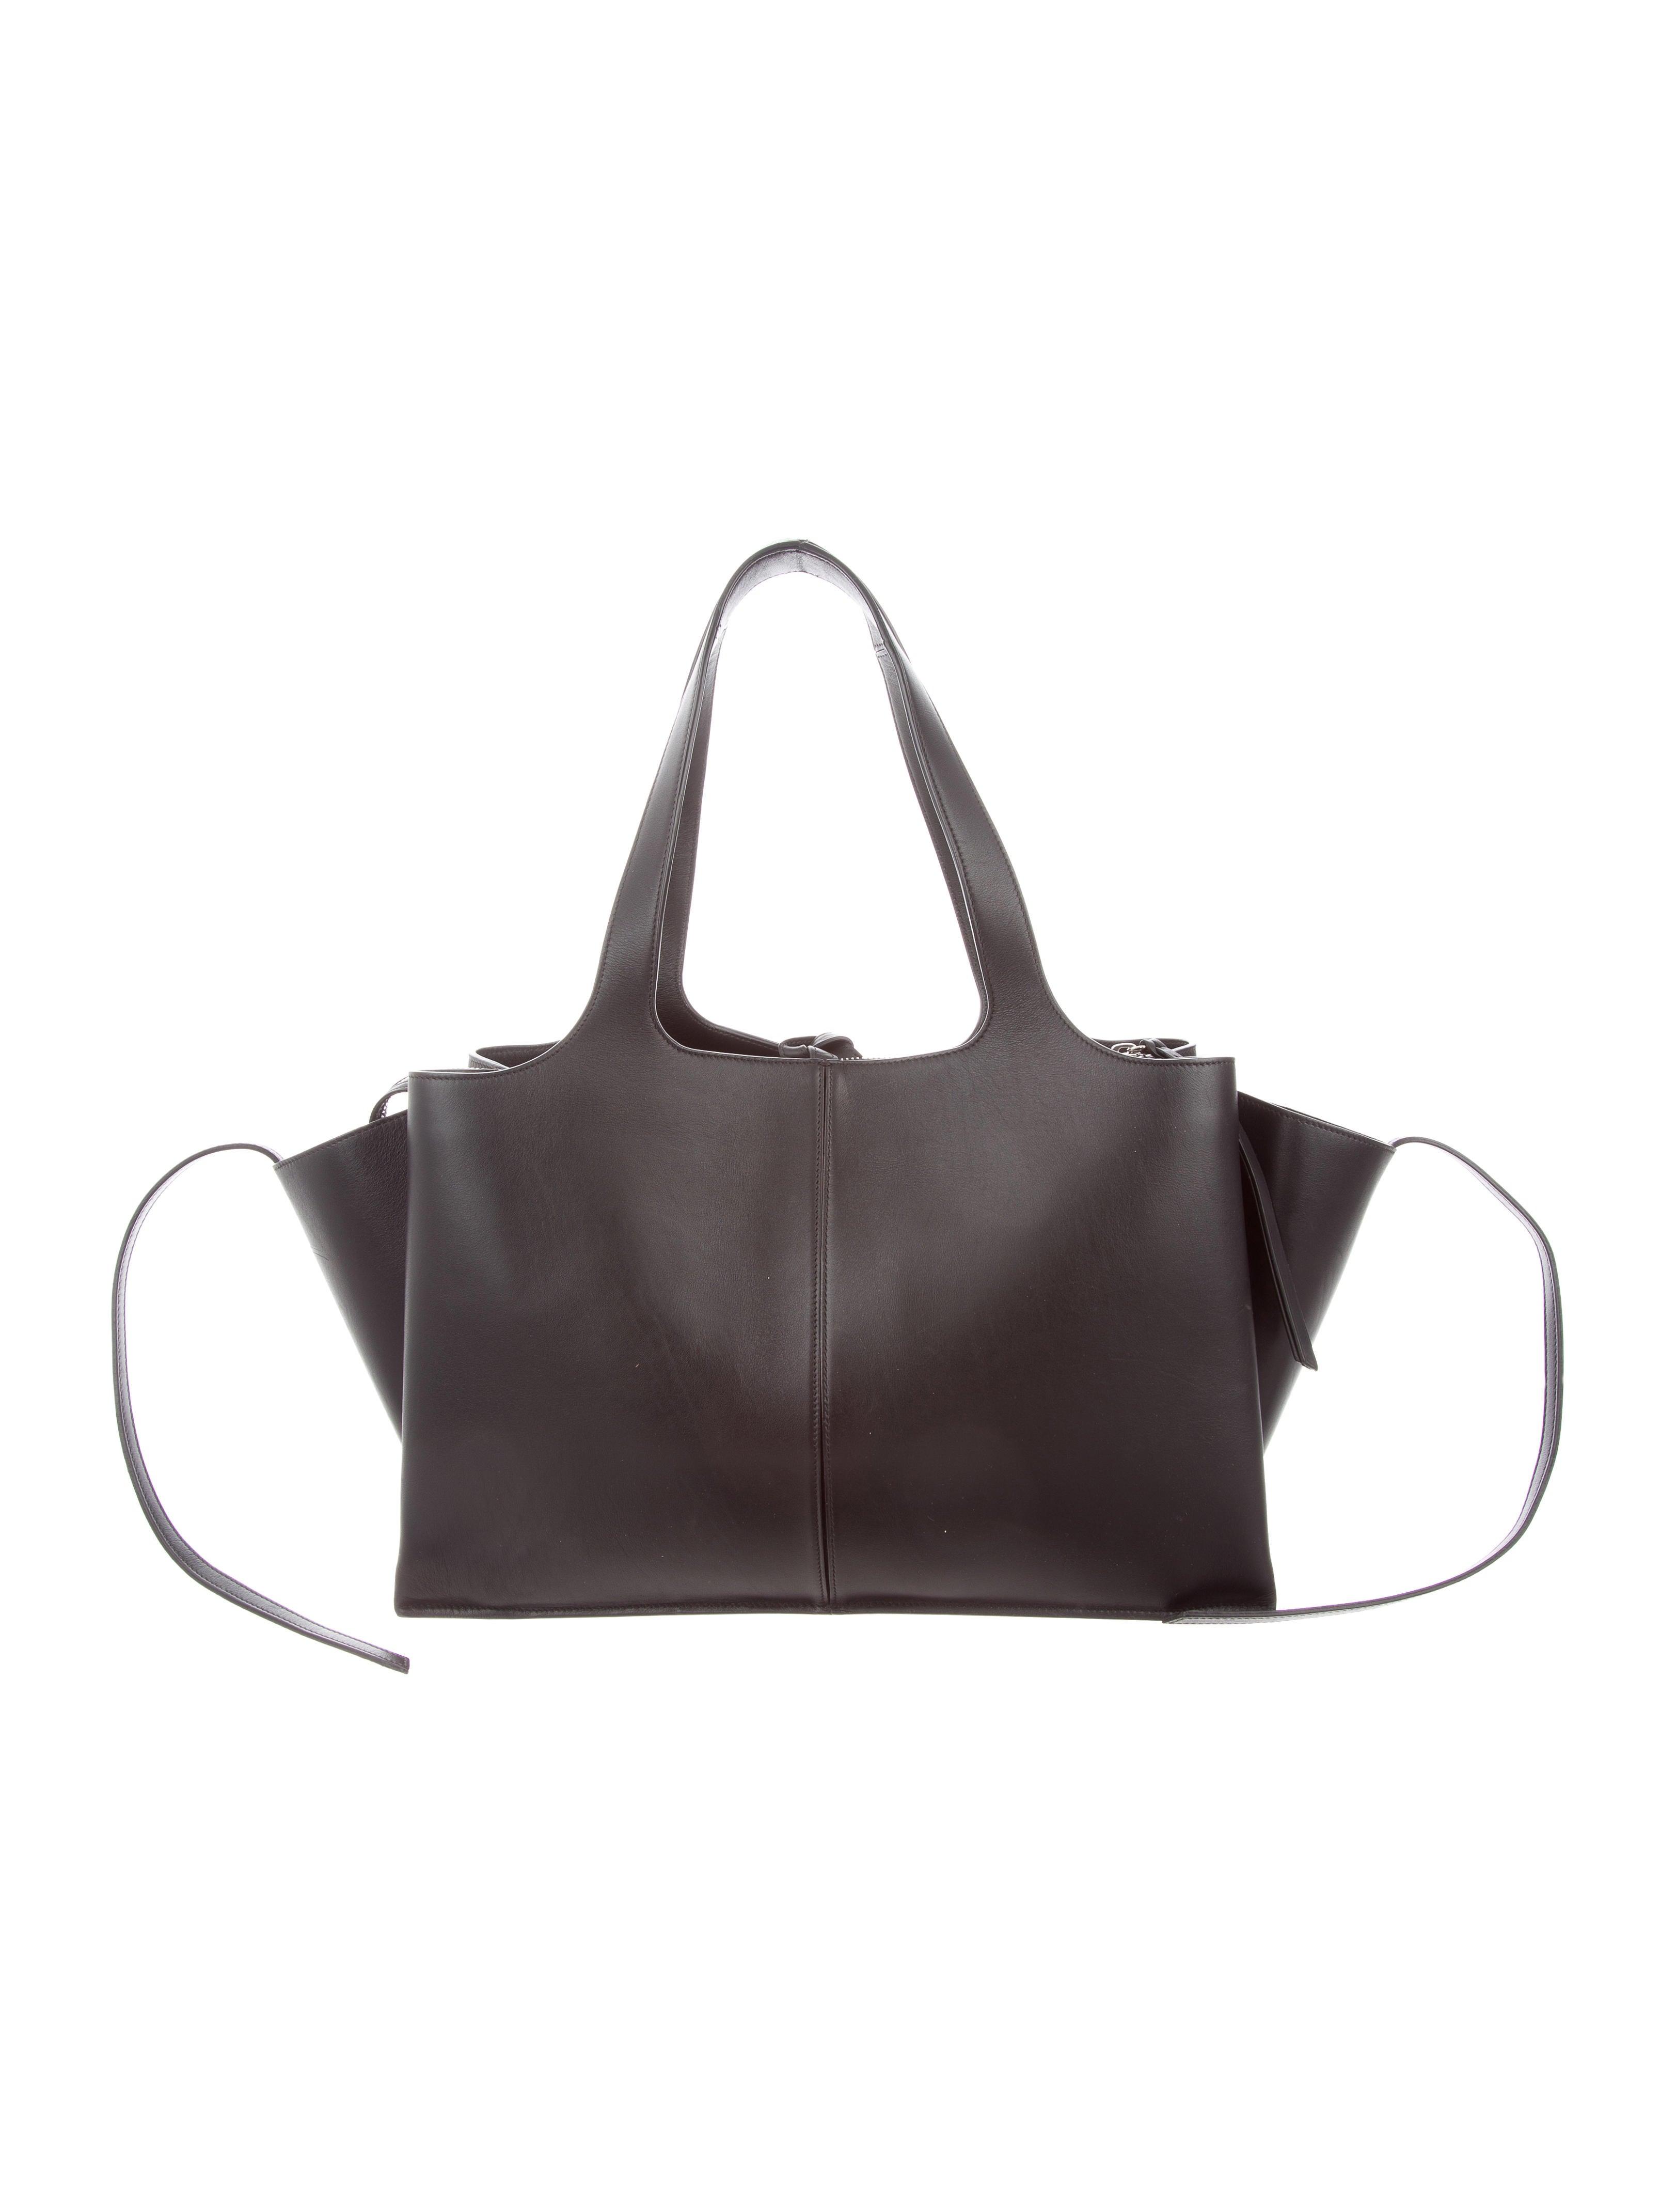 Céline 2016 Medium Tri-Fold Bag - Handbags - CEL59866  34d2357b285e1